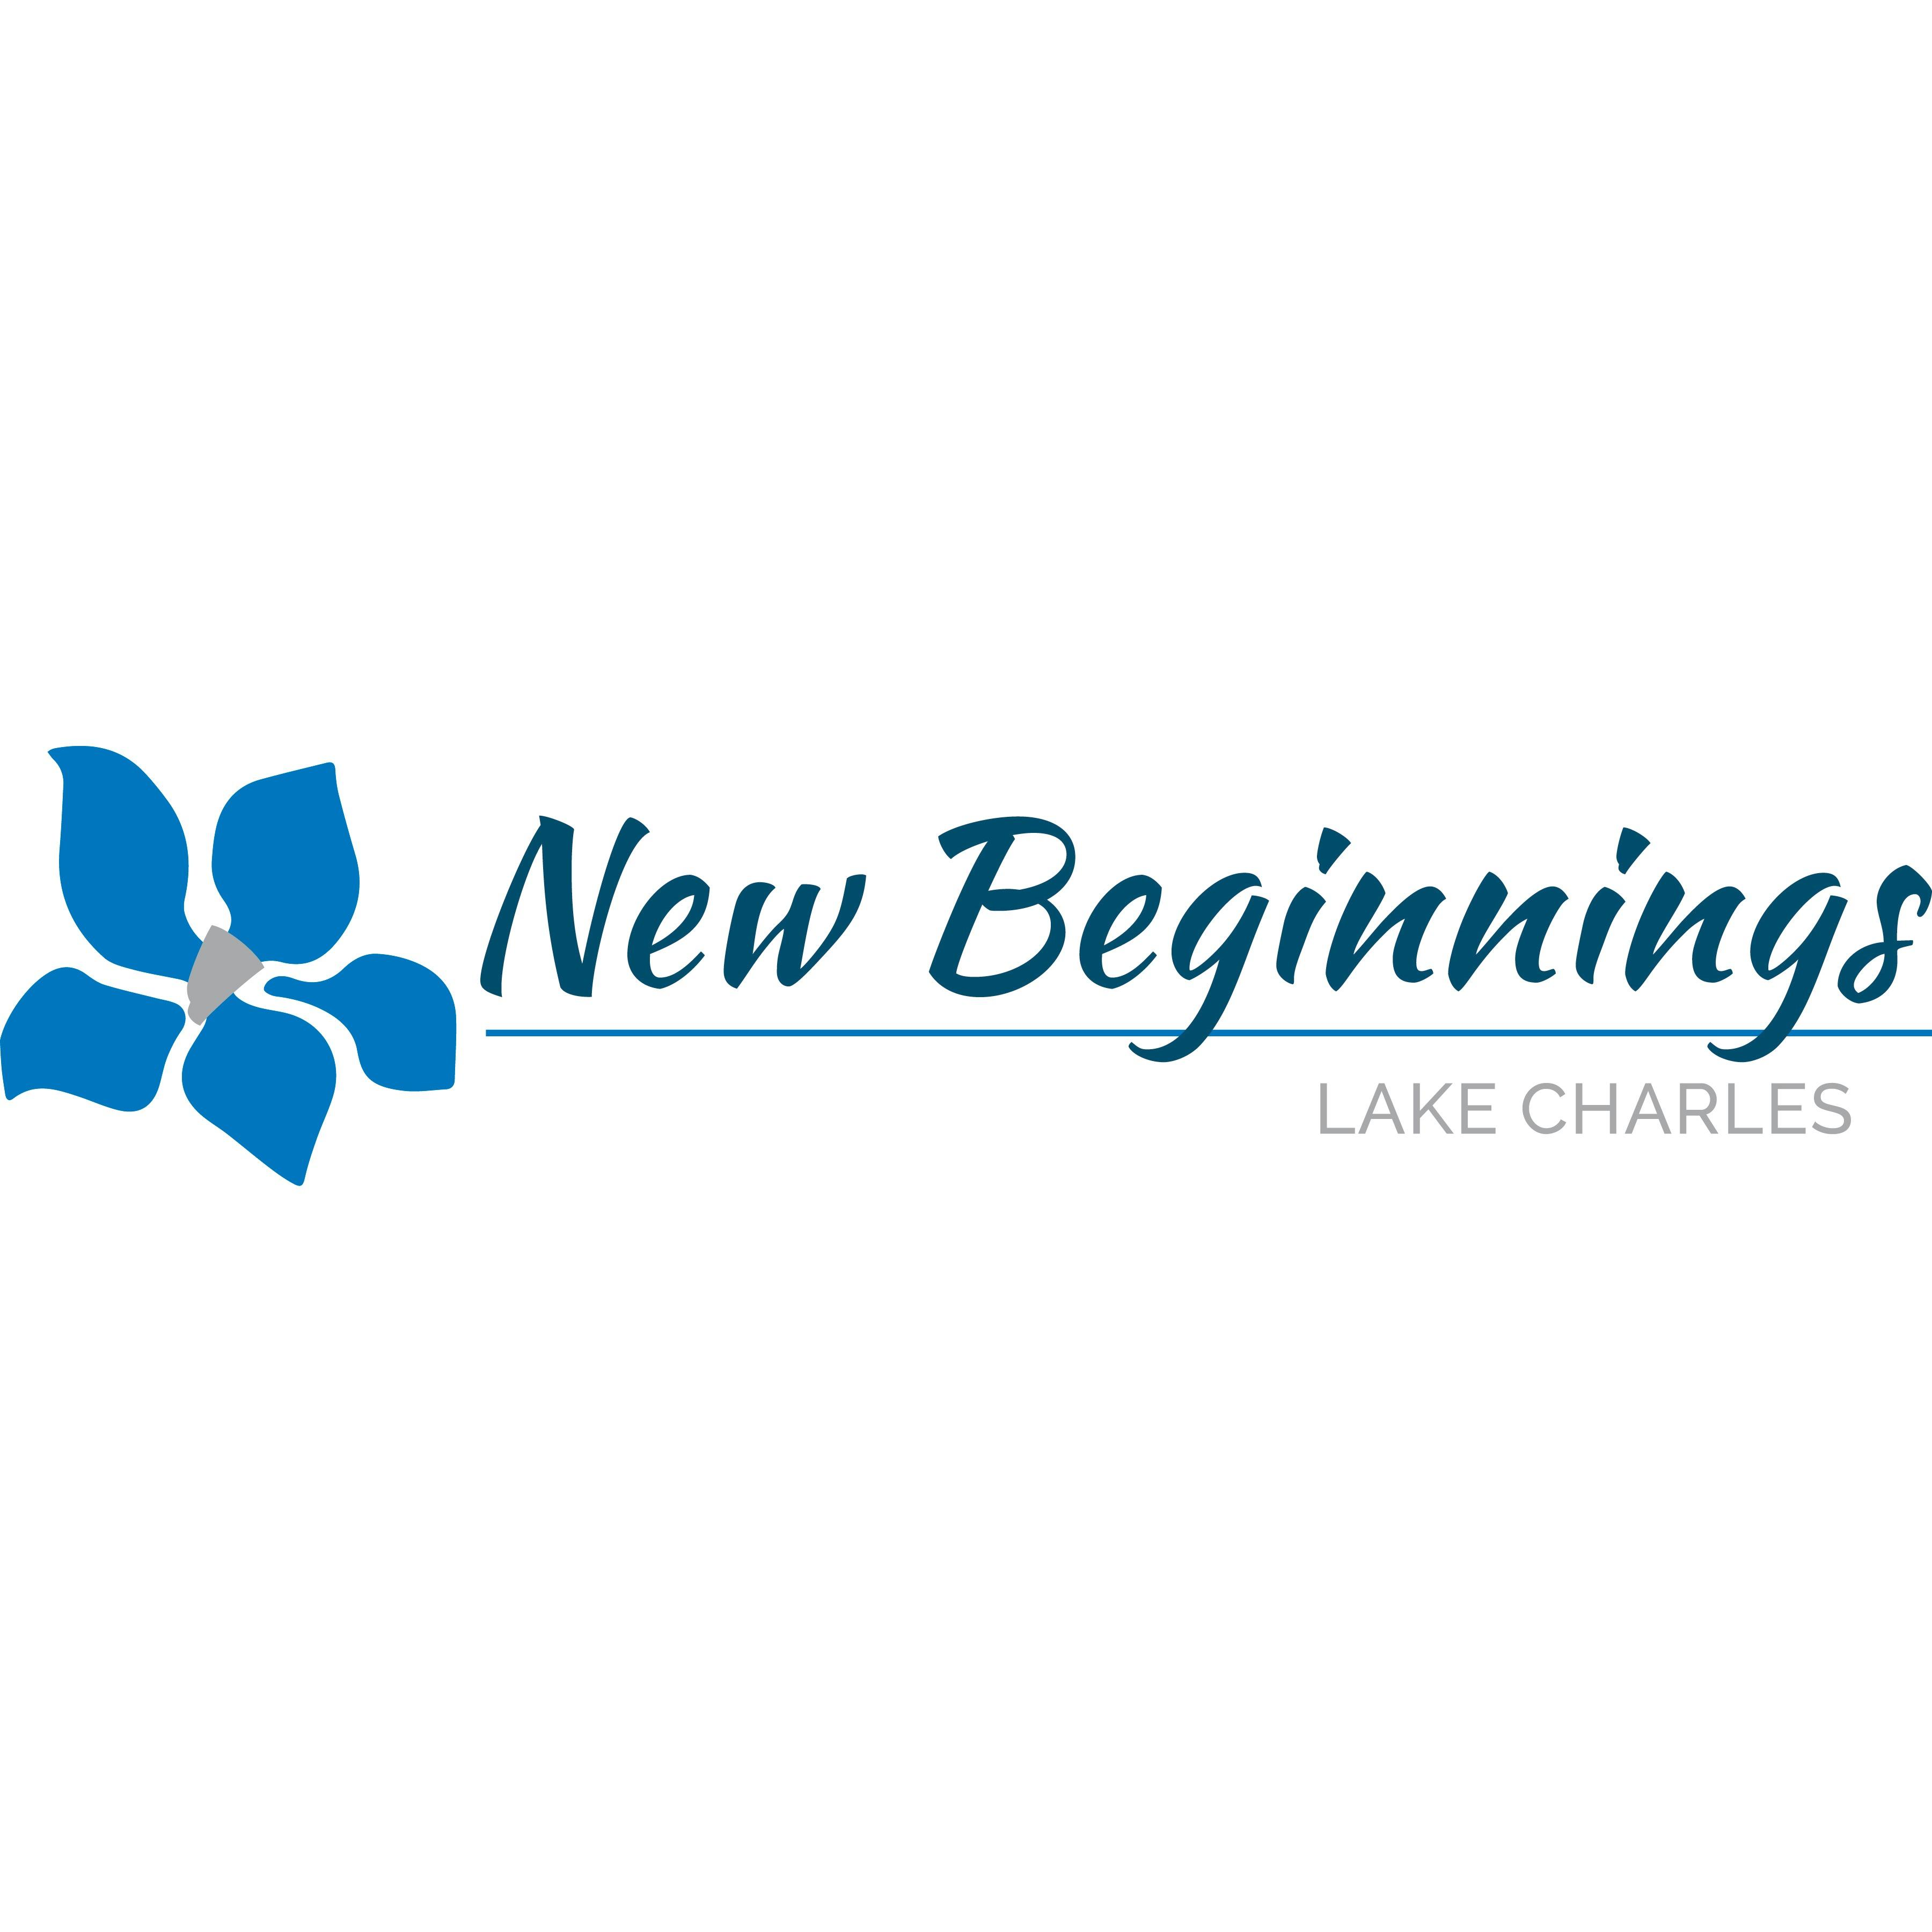 New Beginnings Lake Charles image 5